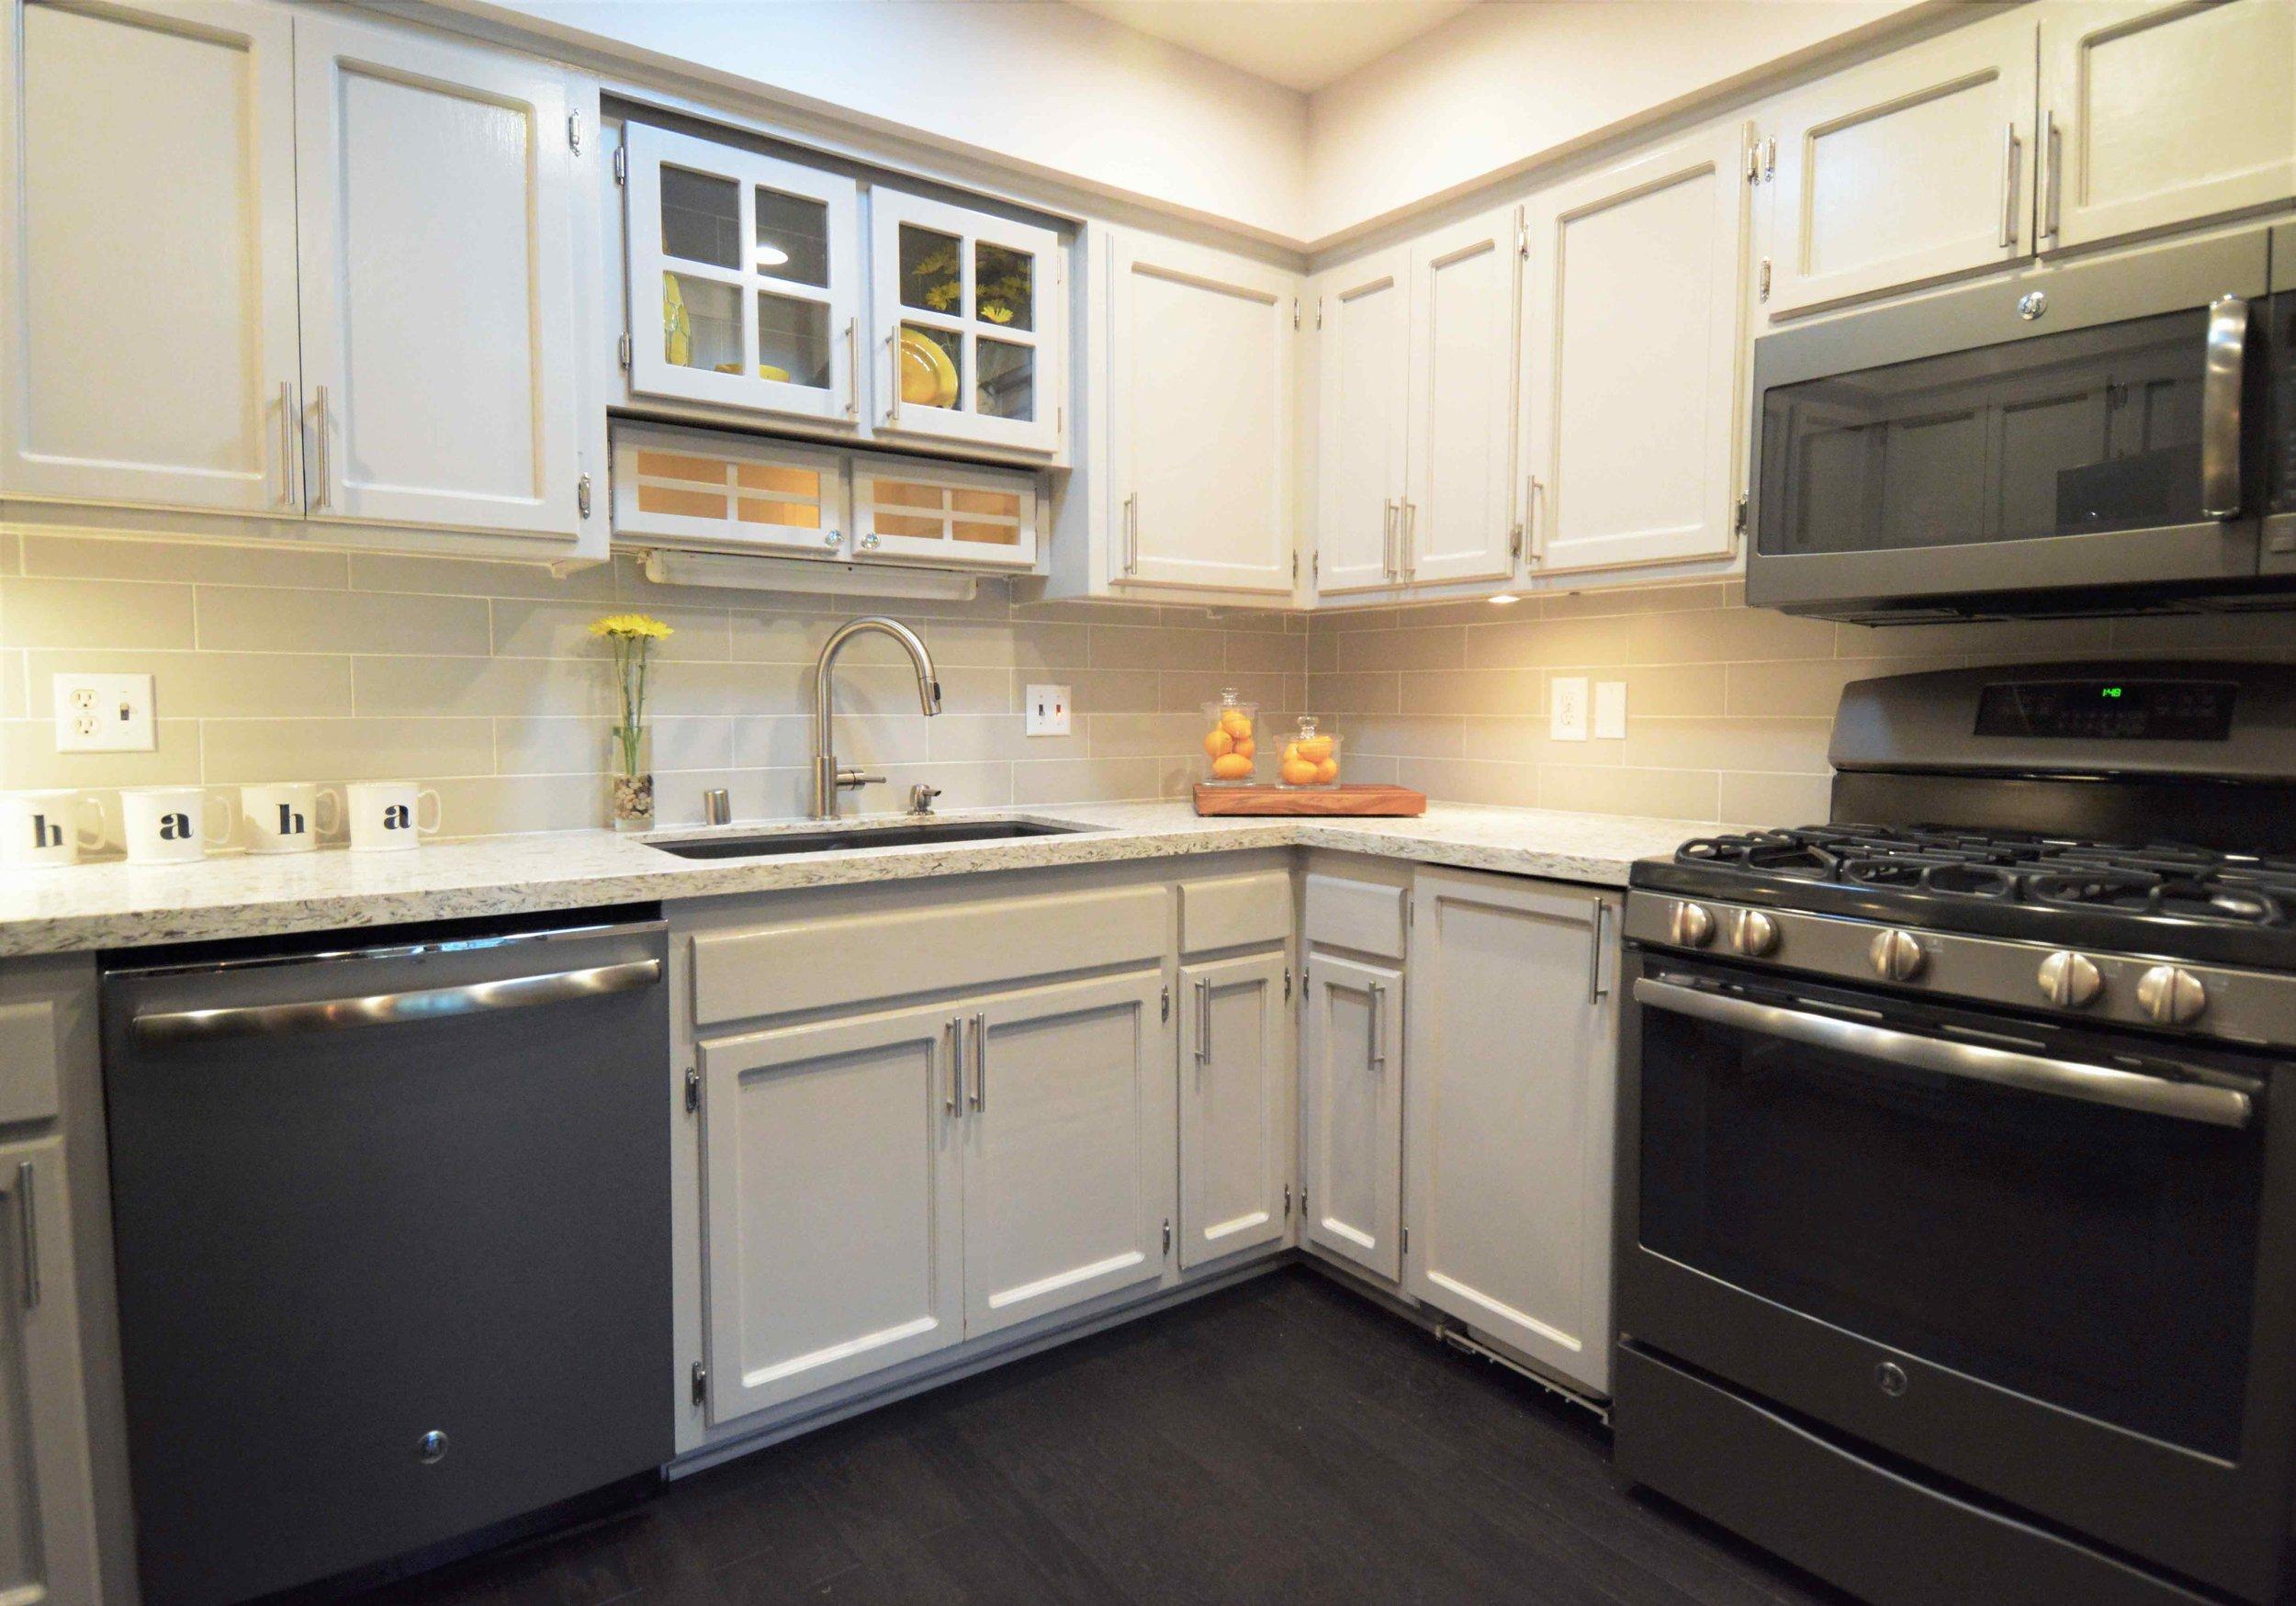 kitchen-2_optimized.jpg